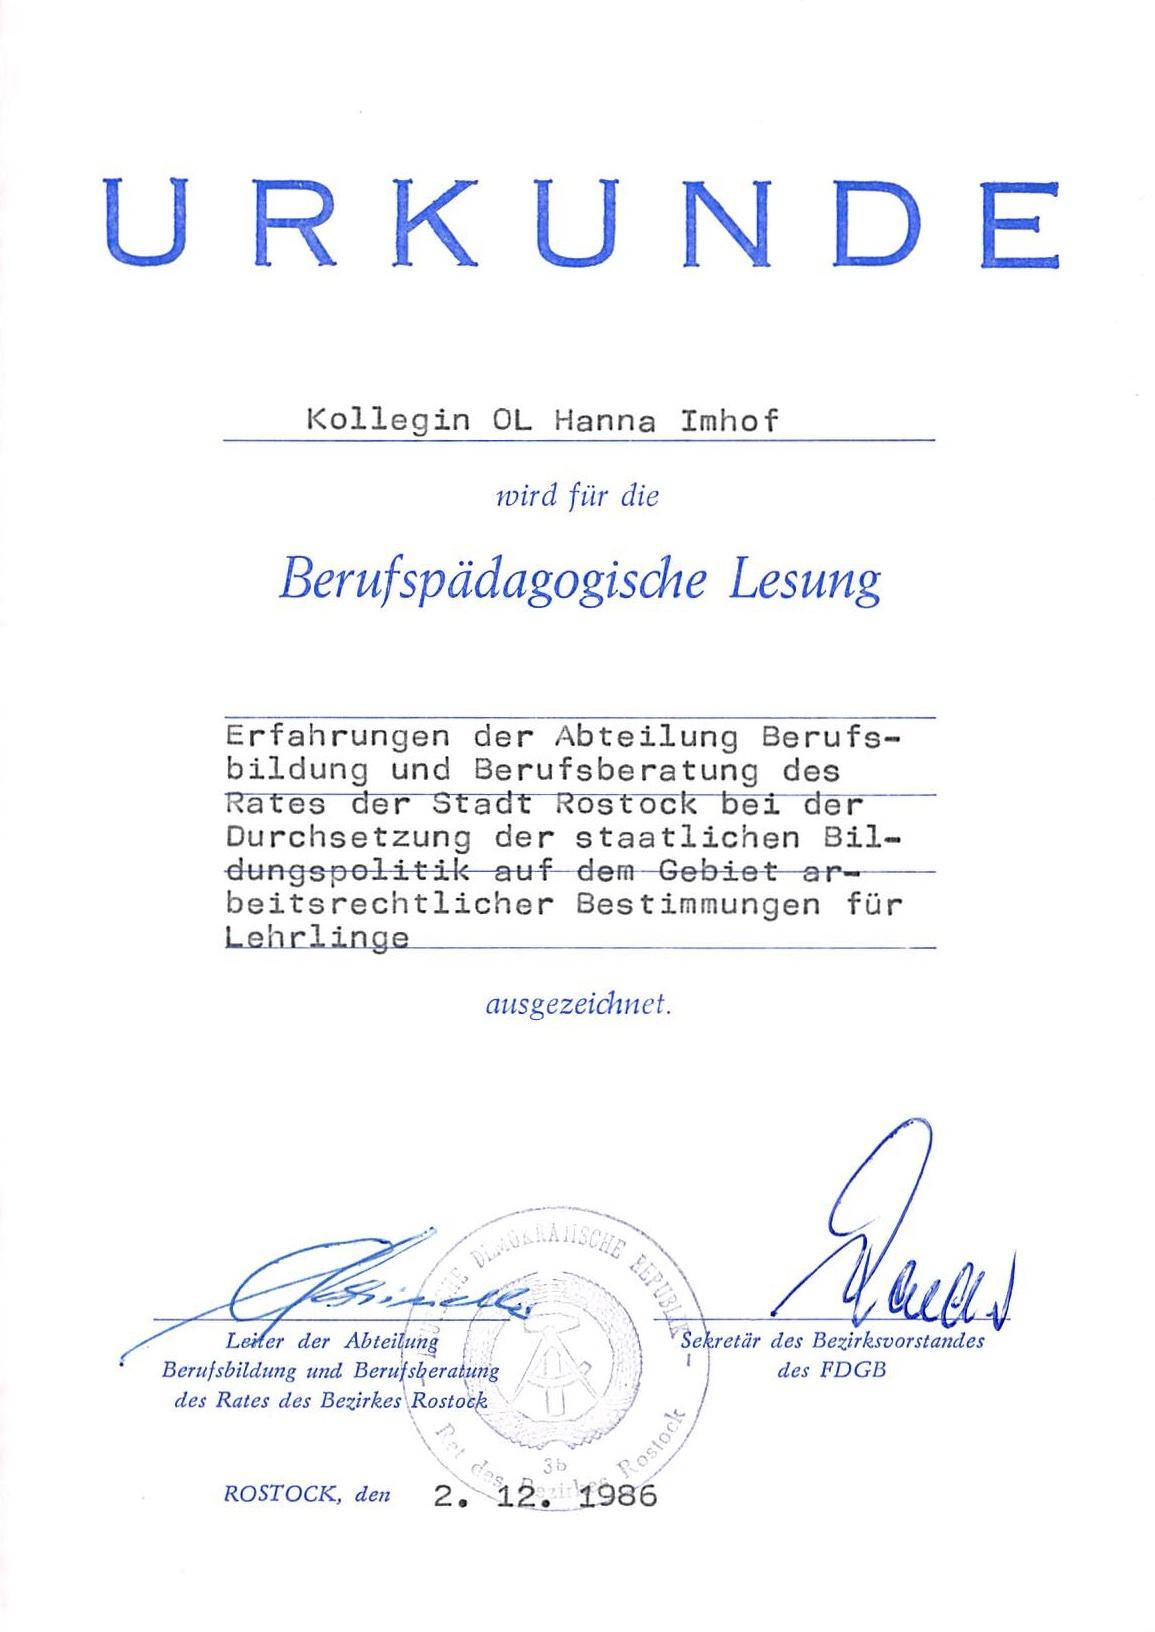 0059_Urkunde Berufspädagogische Lesung Hanna Imhof_HRO.jpg